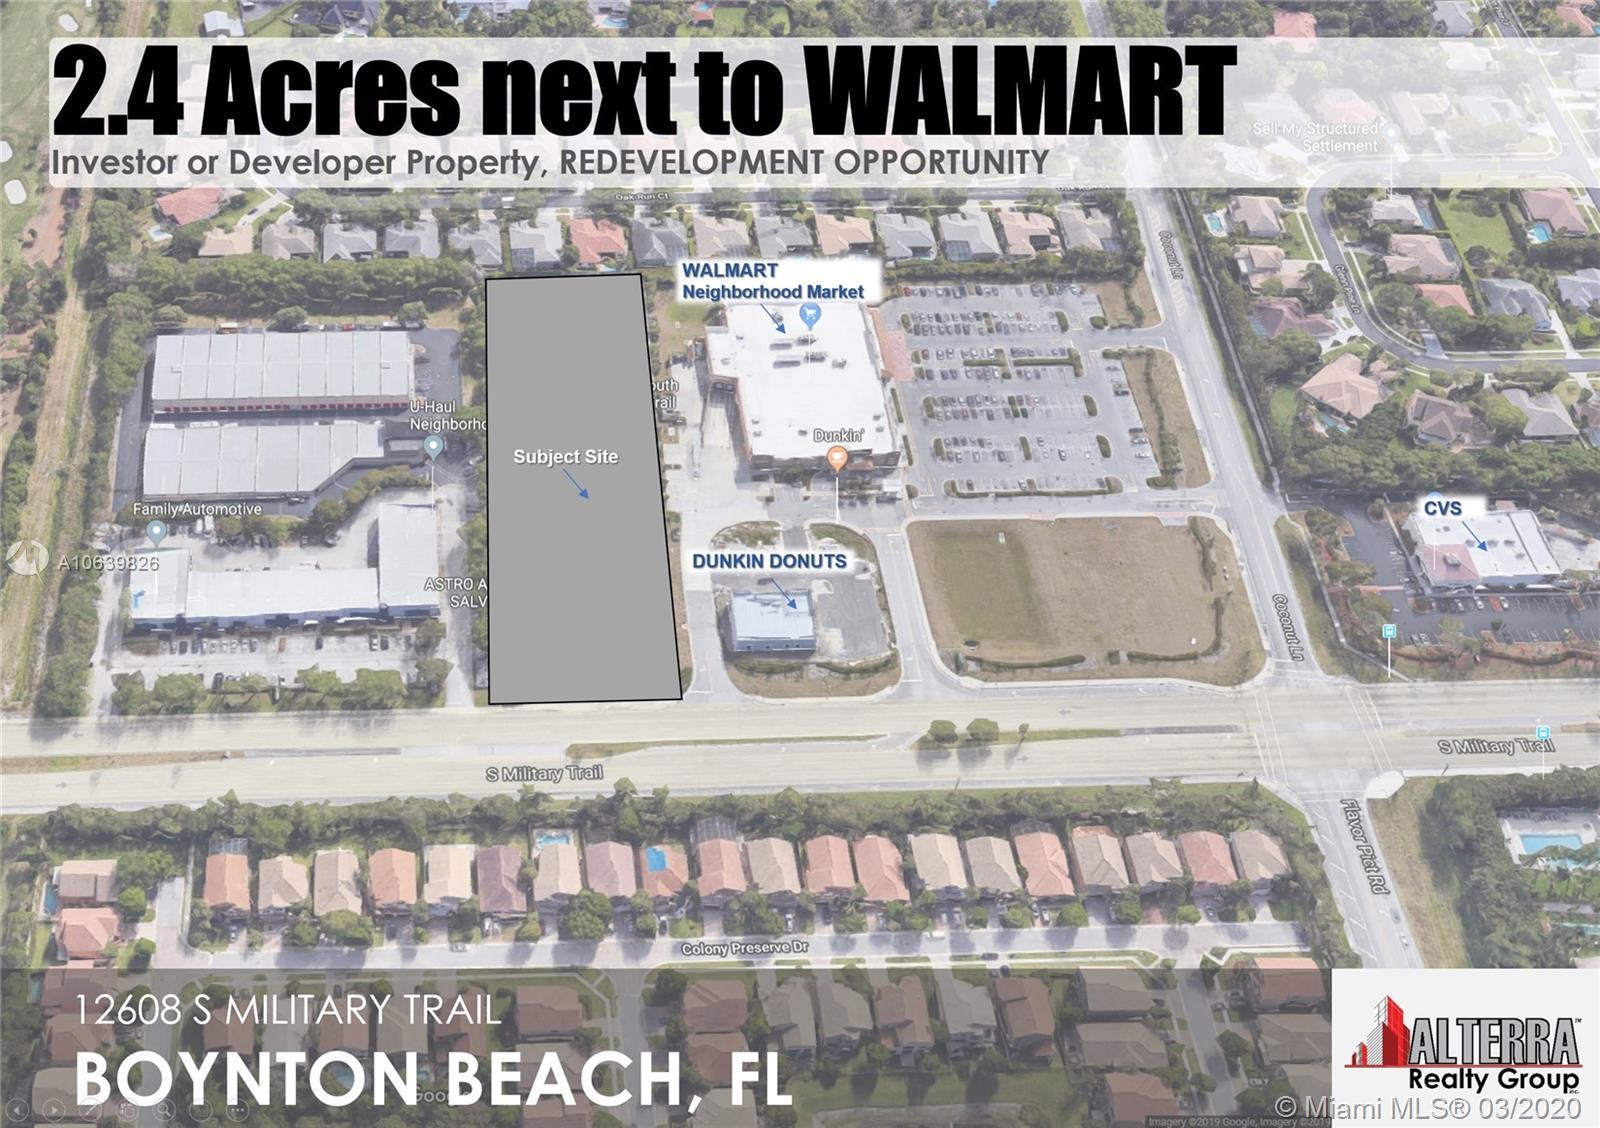 12608 S Military Trl, Boynton Beach, FL 33436